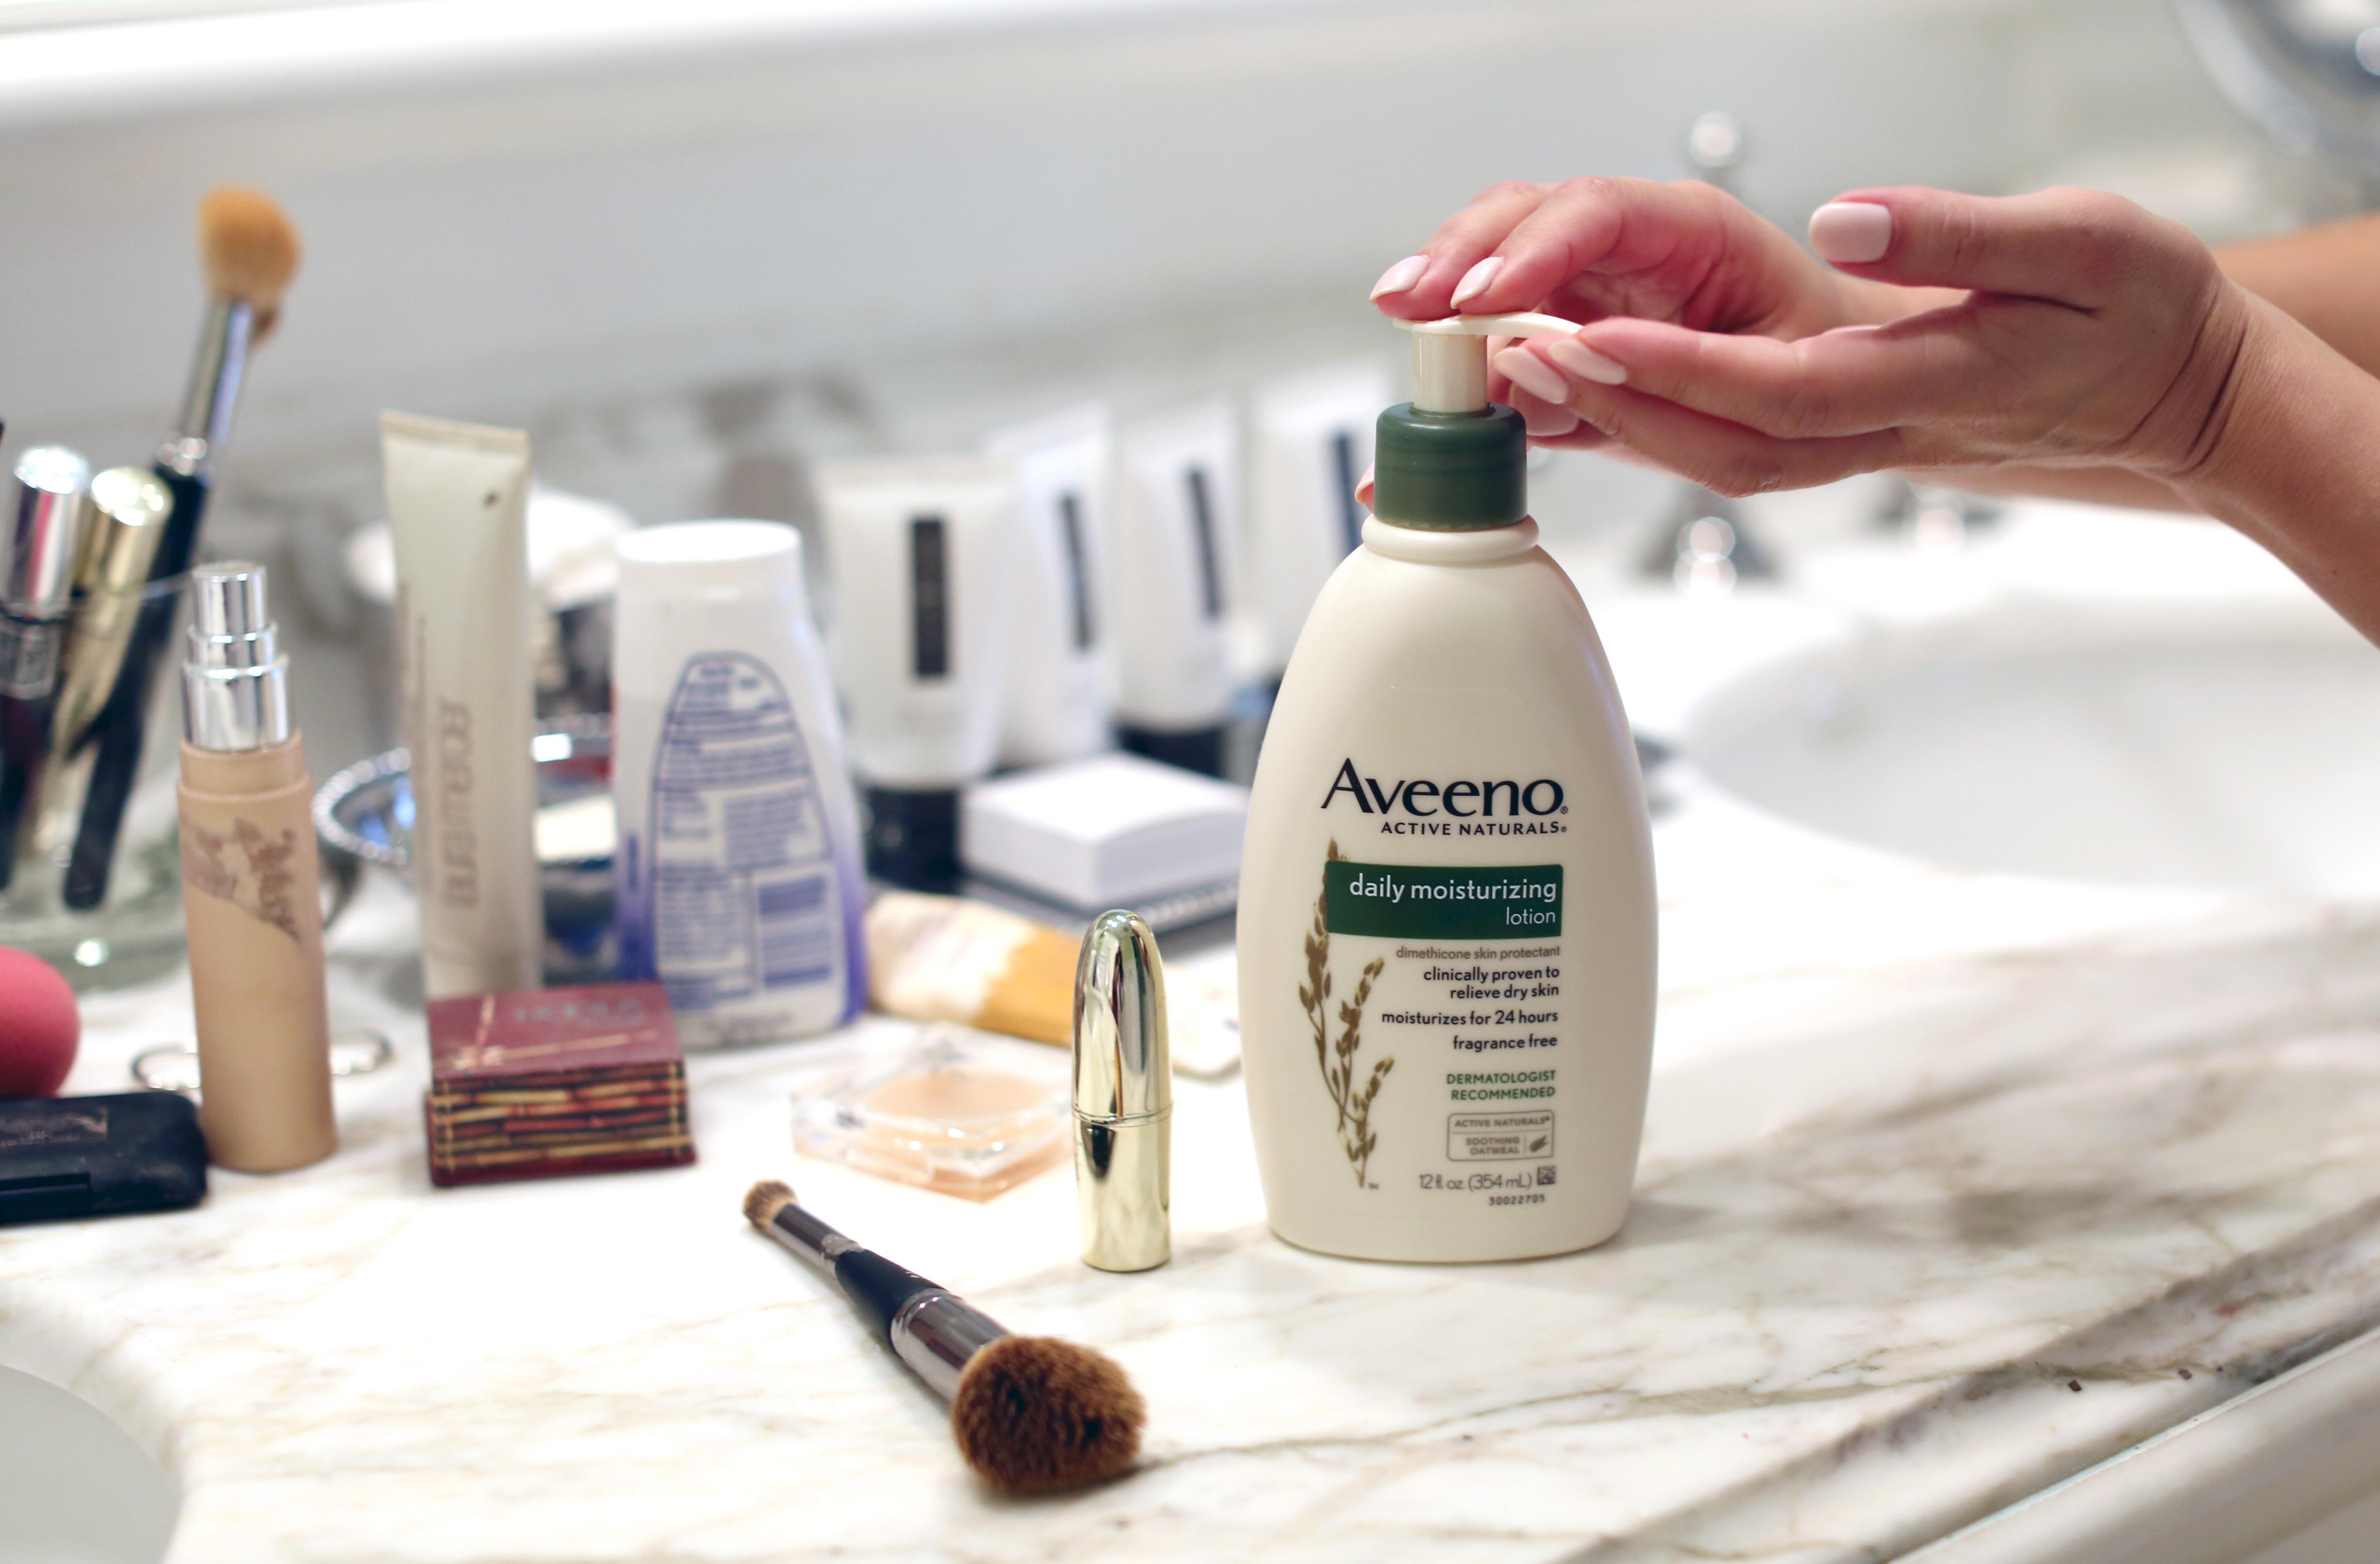 Aveeno Skincare Challenge Update - Life With Me by Marianna Hewitt